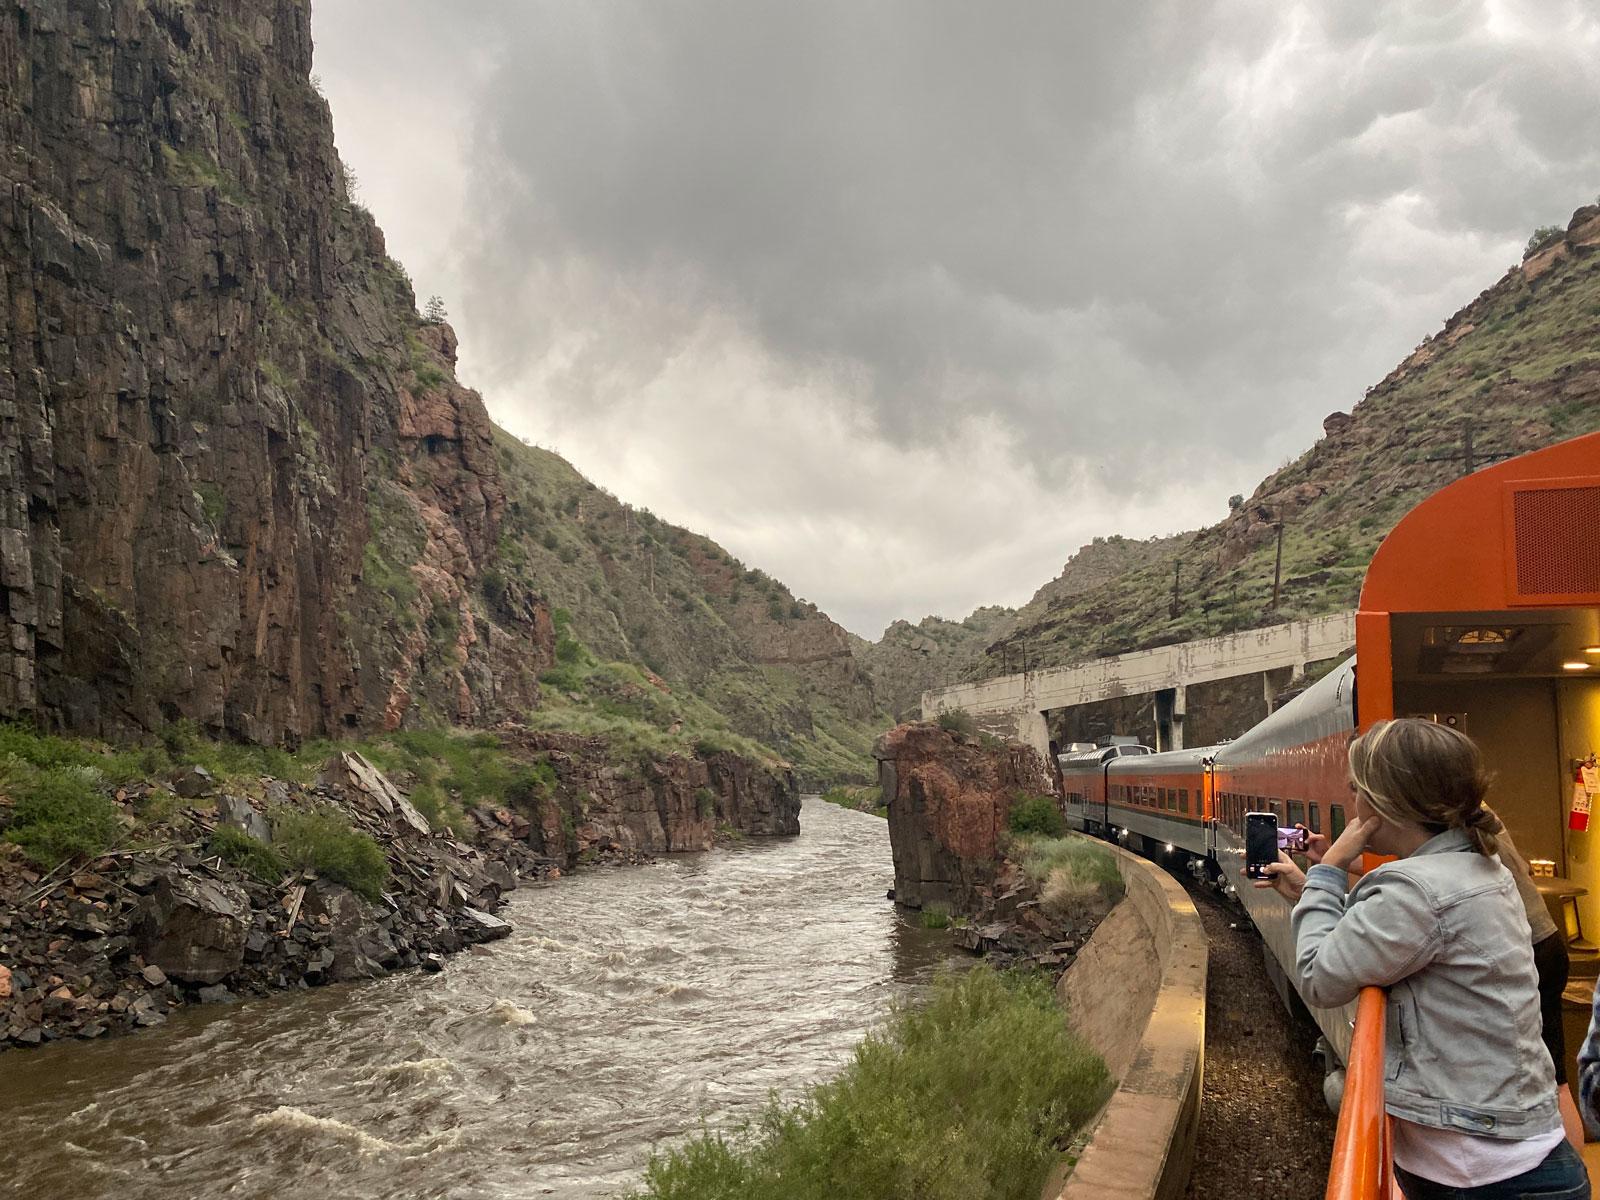 royal gorge route railroad on the arkansas river